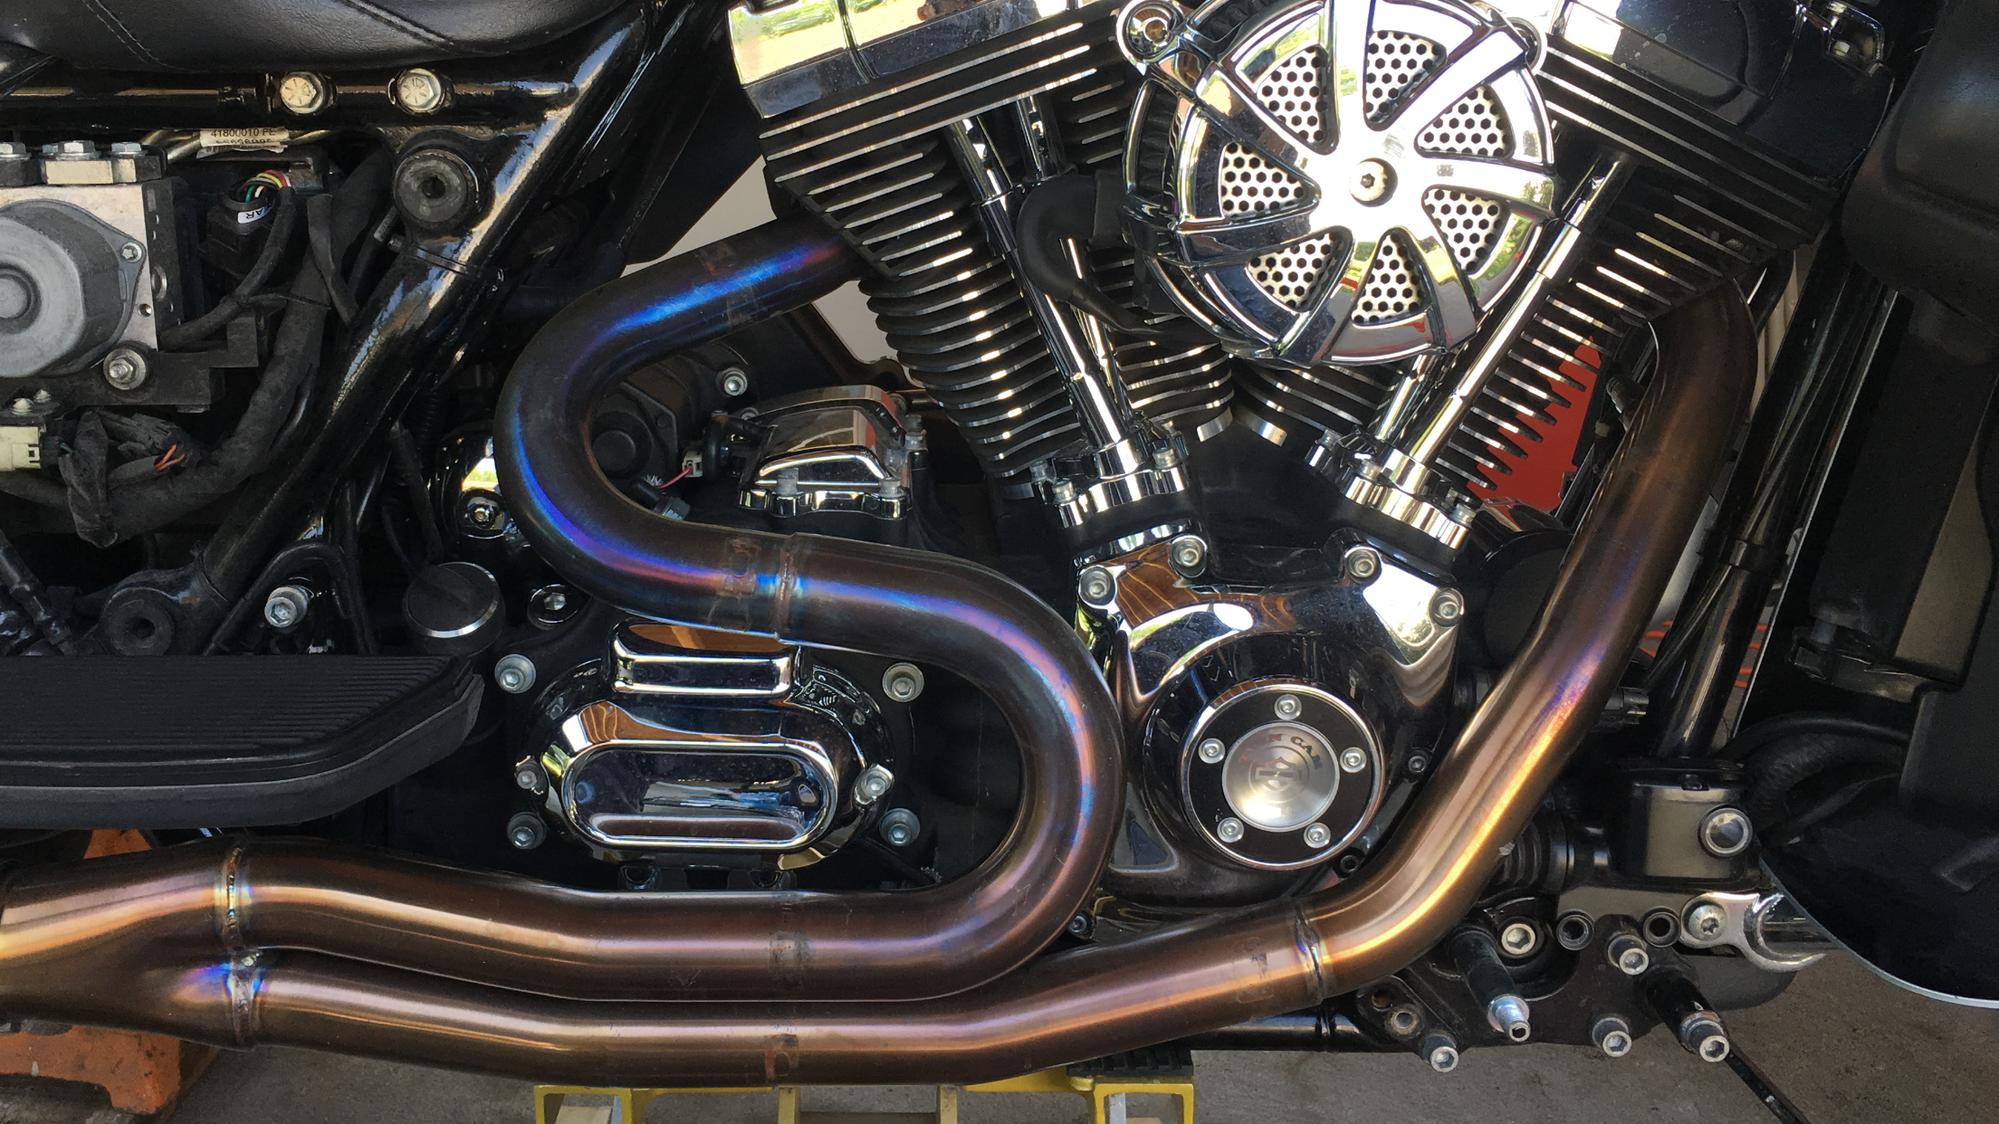 Exhaust valve damage? - Harley Davidson Forums